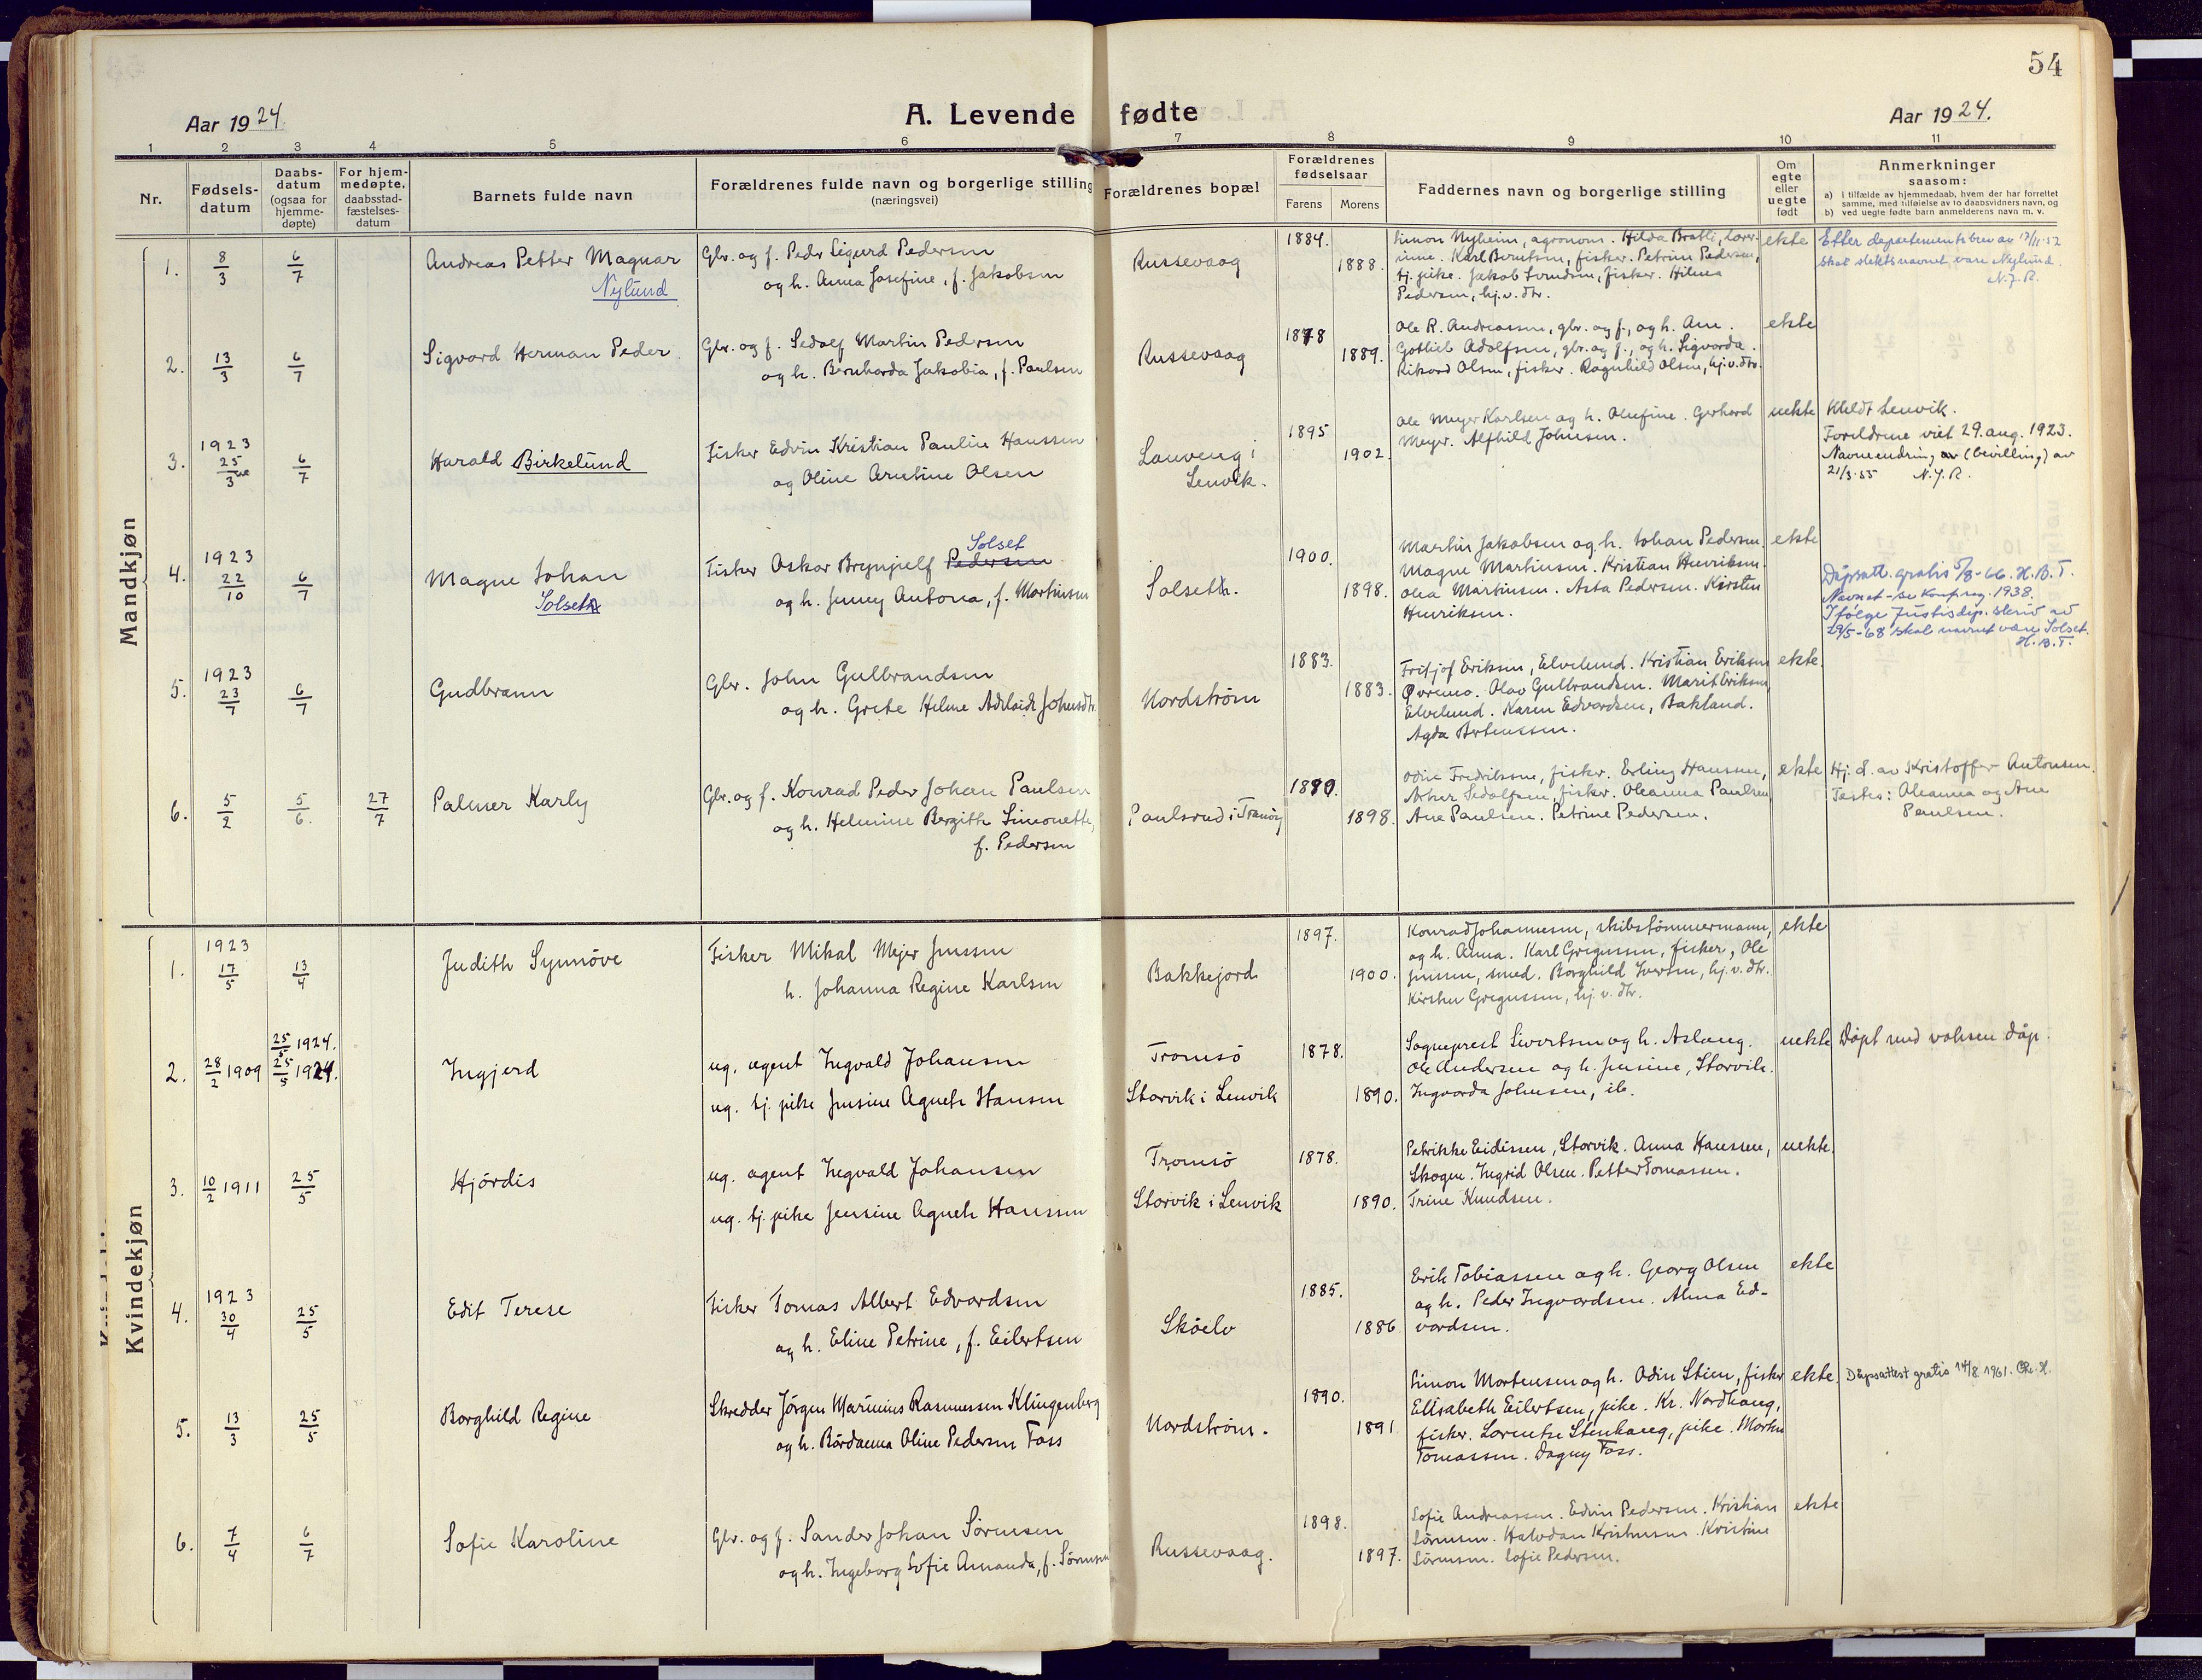 SATØ, Tranøy sokneprestkontor, I/Ia/Iaa/L0015kirke: Ministerialbok nr. 15, 1919-1928, s. 54